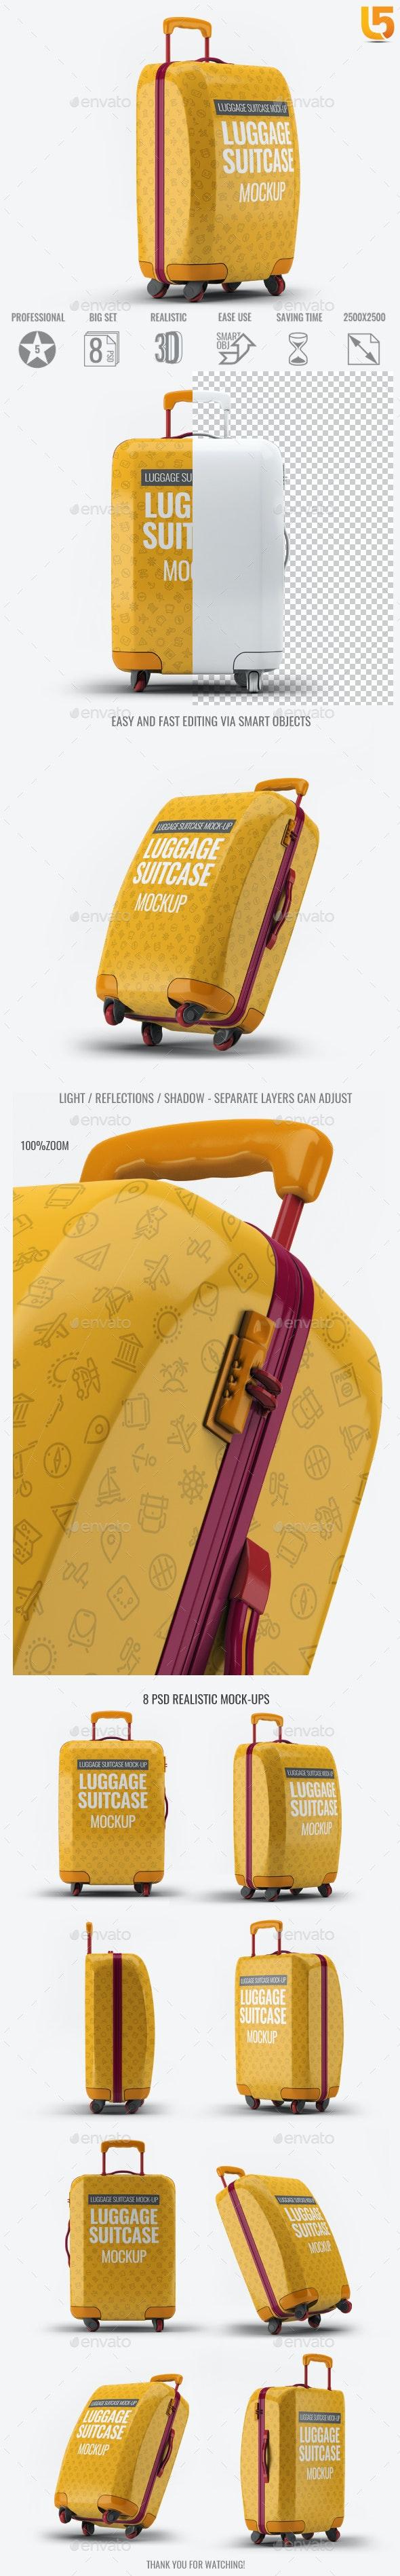 Luggage Suitcase Mock-up - Product Mock-Ups Graphics